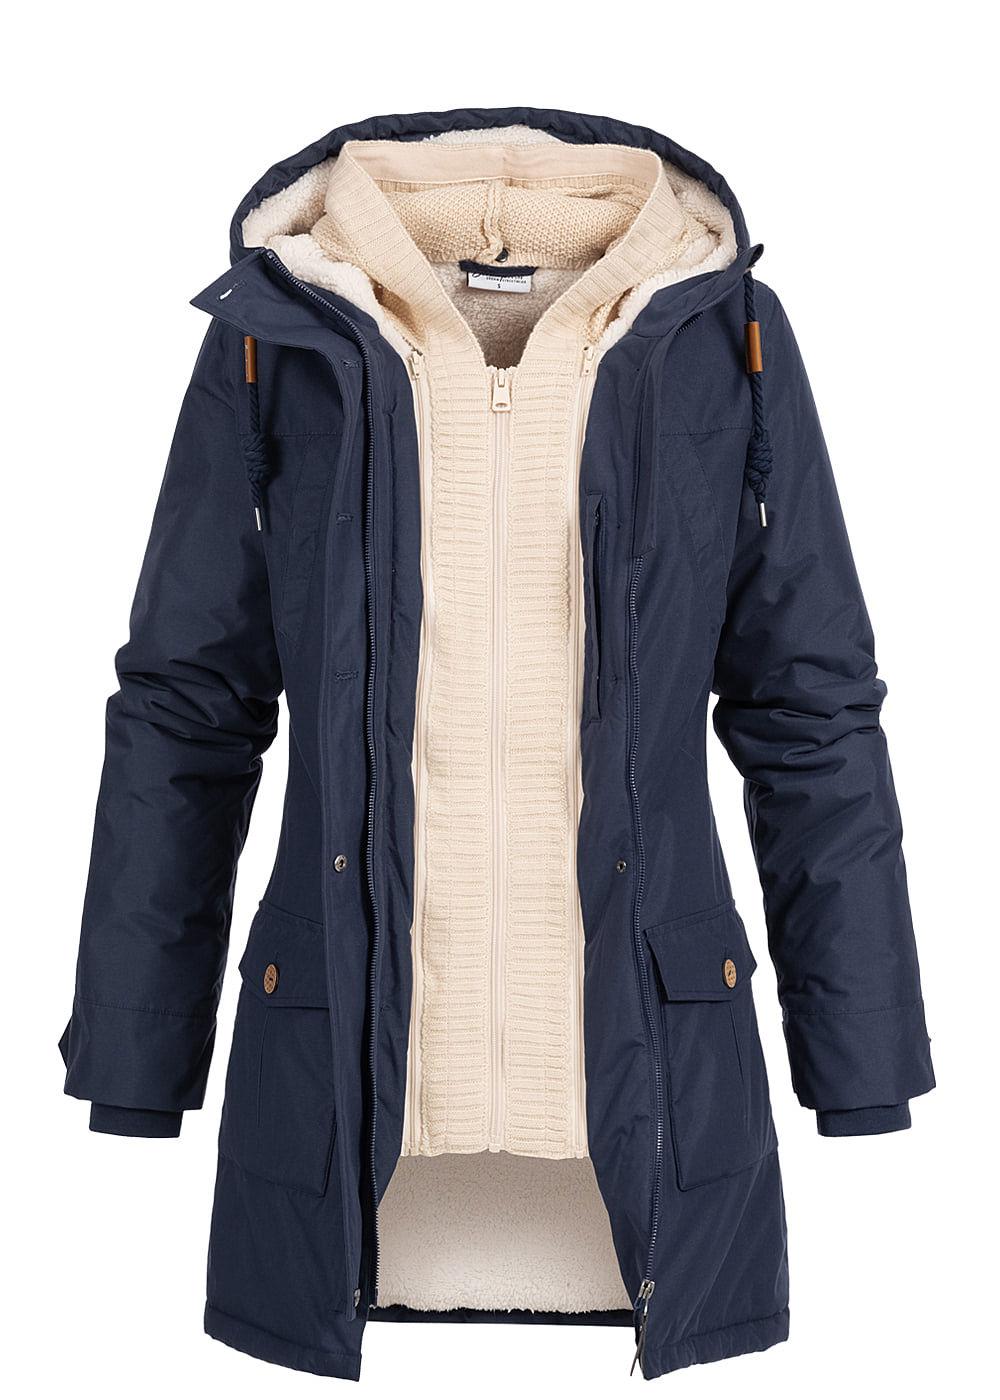 Seventyseven Lifestyle Damen Winter Jacke Kapuze 6 Pockets